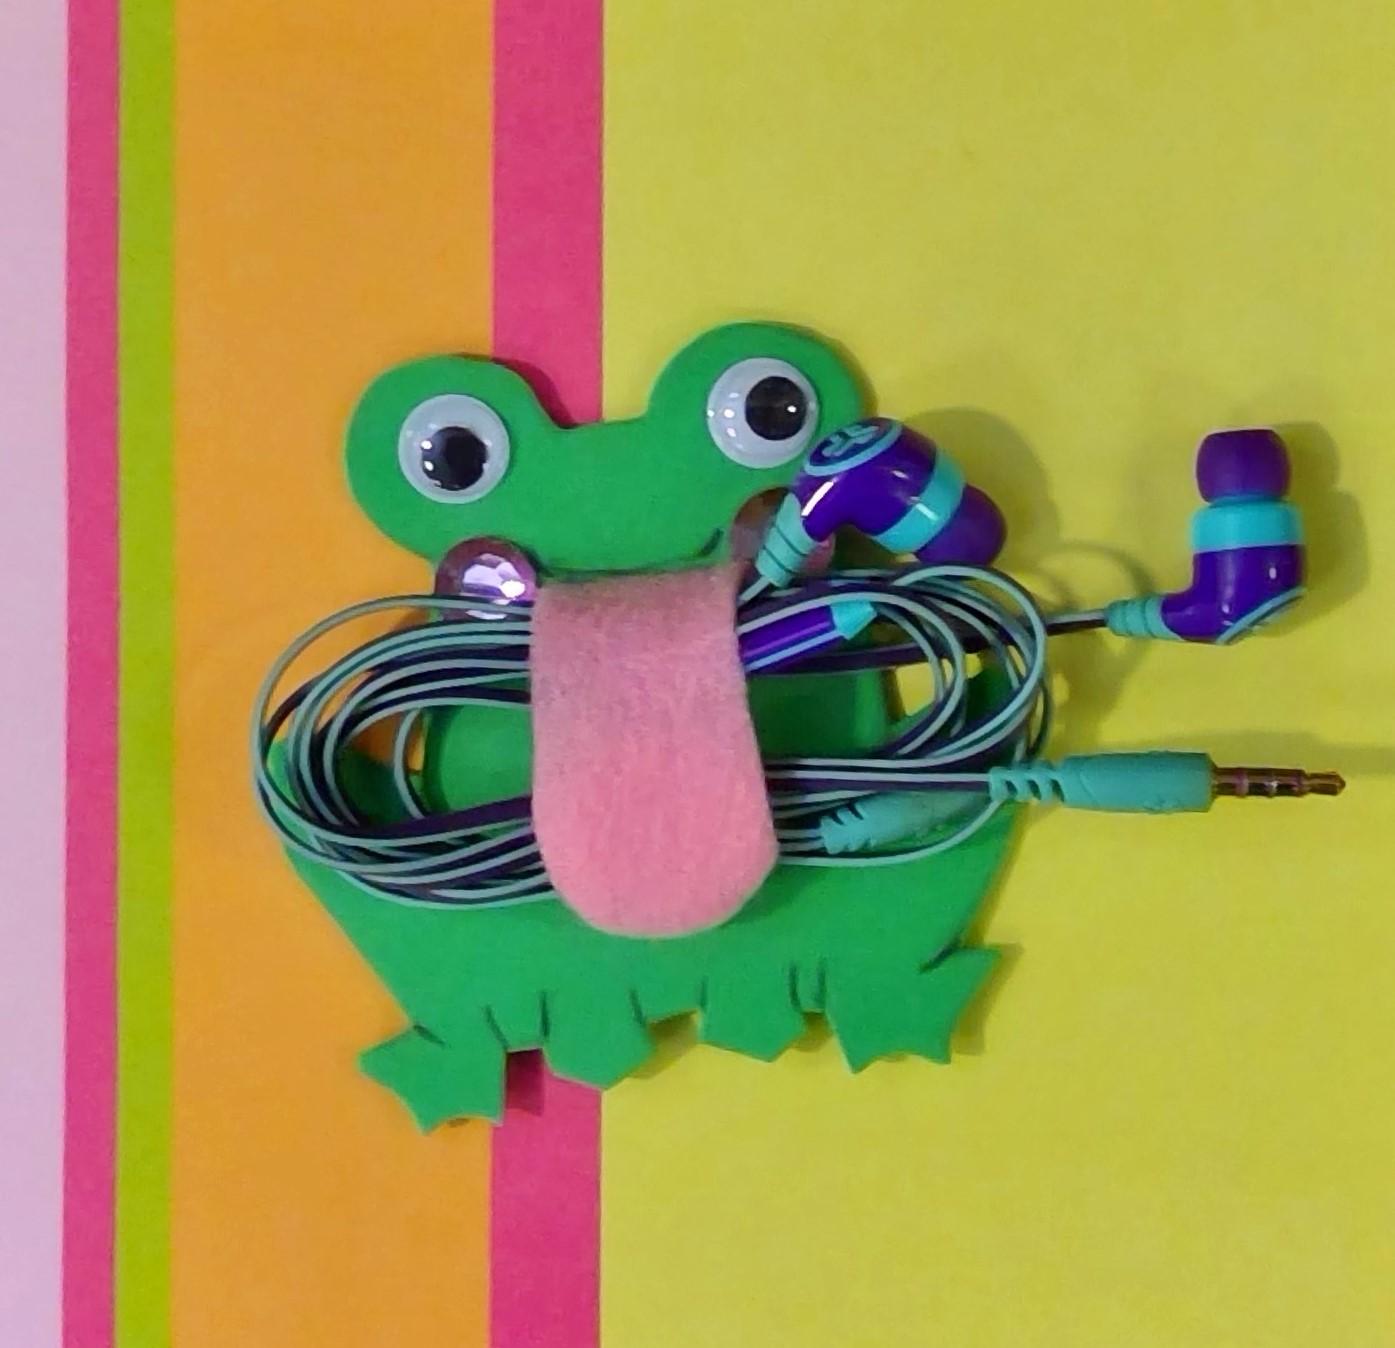 Frog Cord Organizer Craft